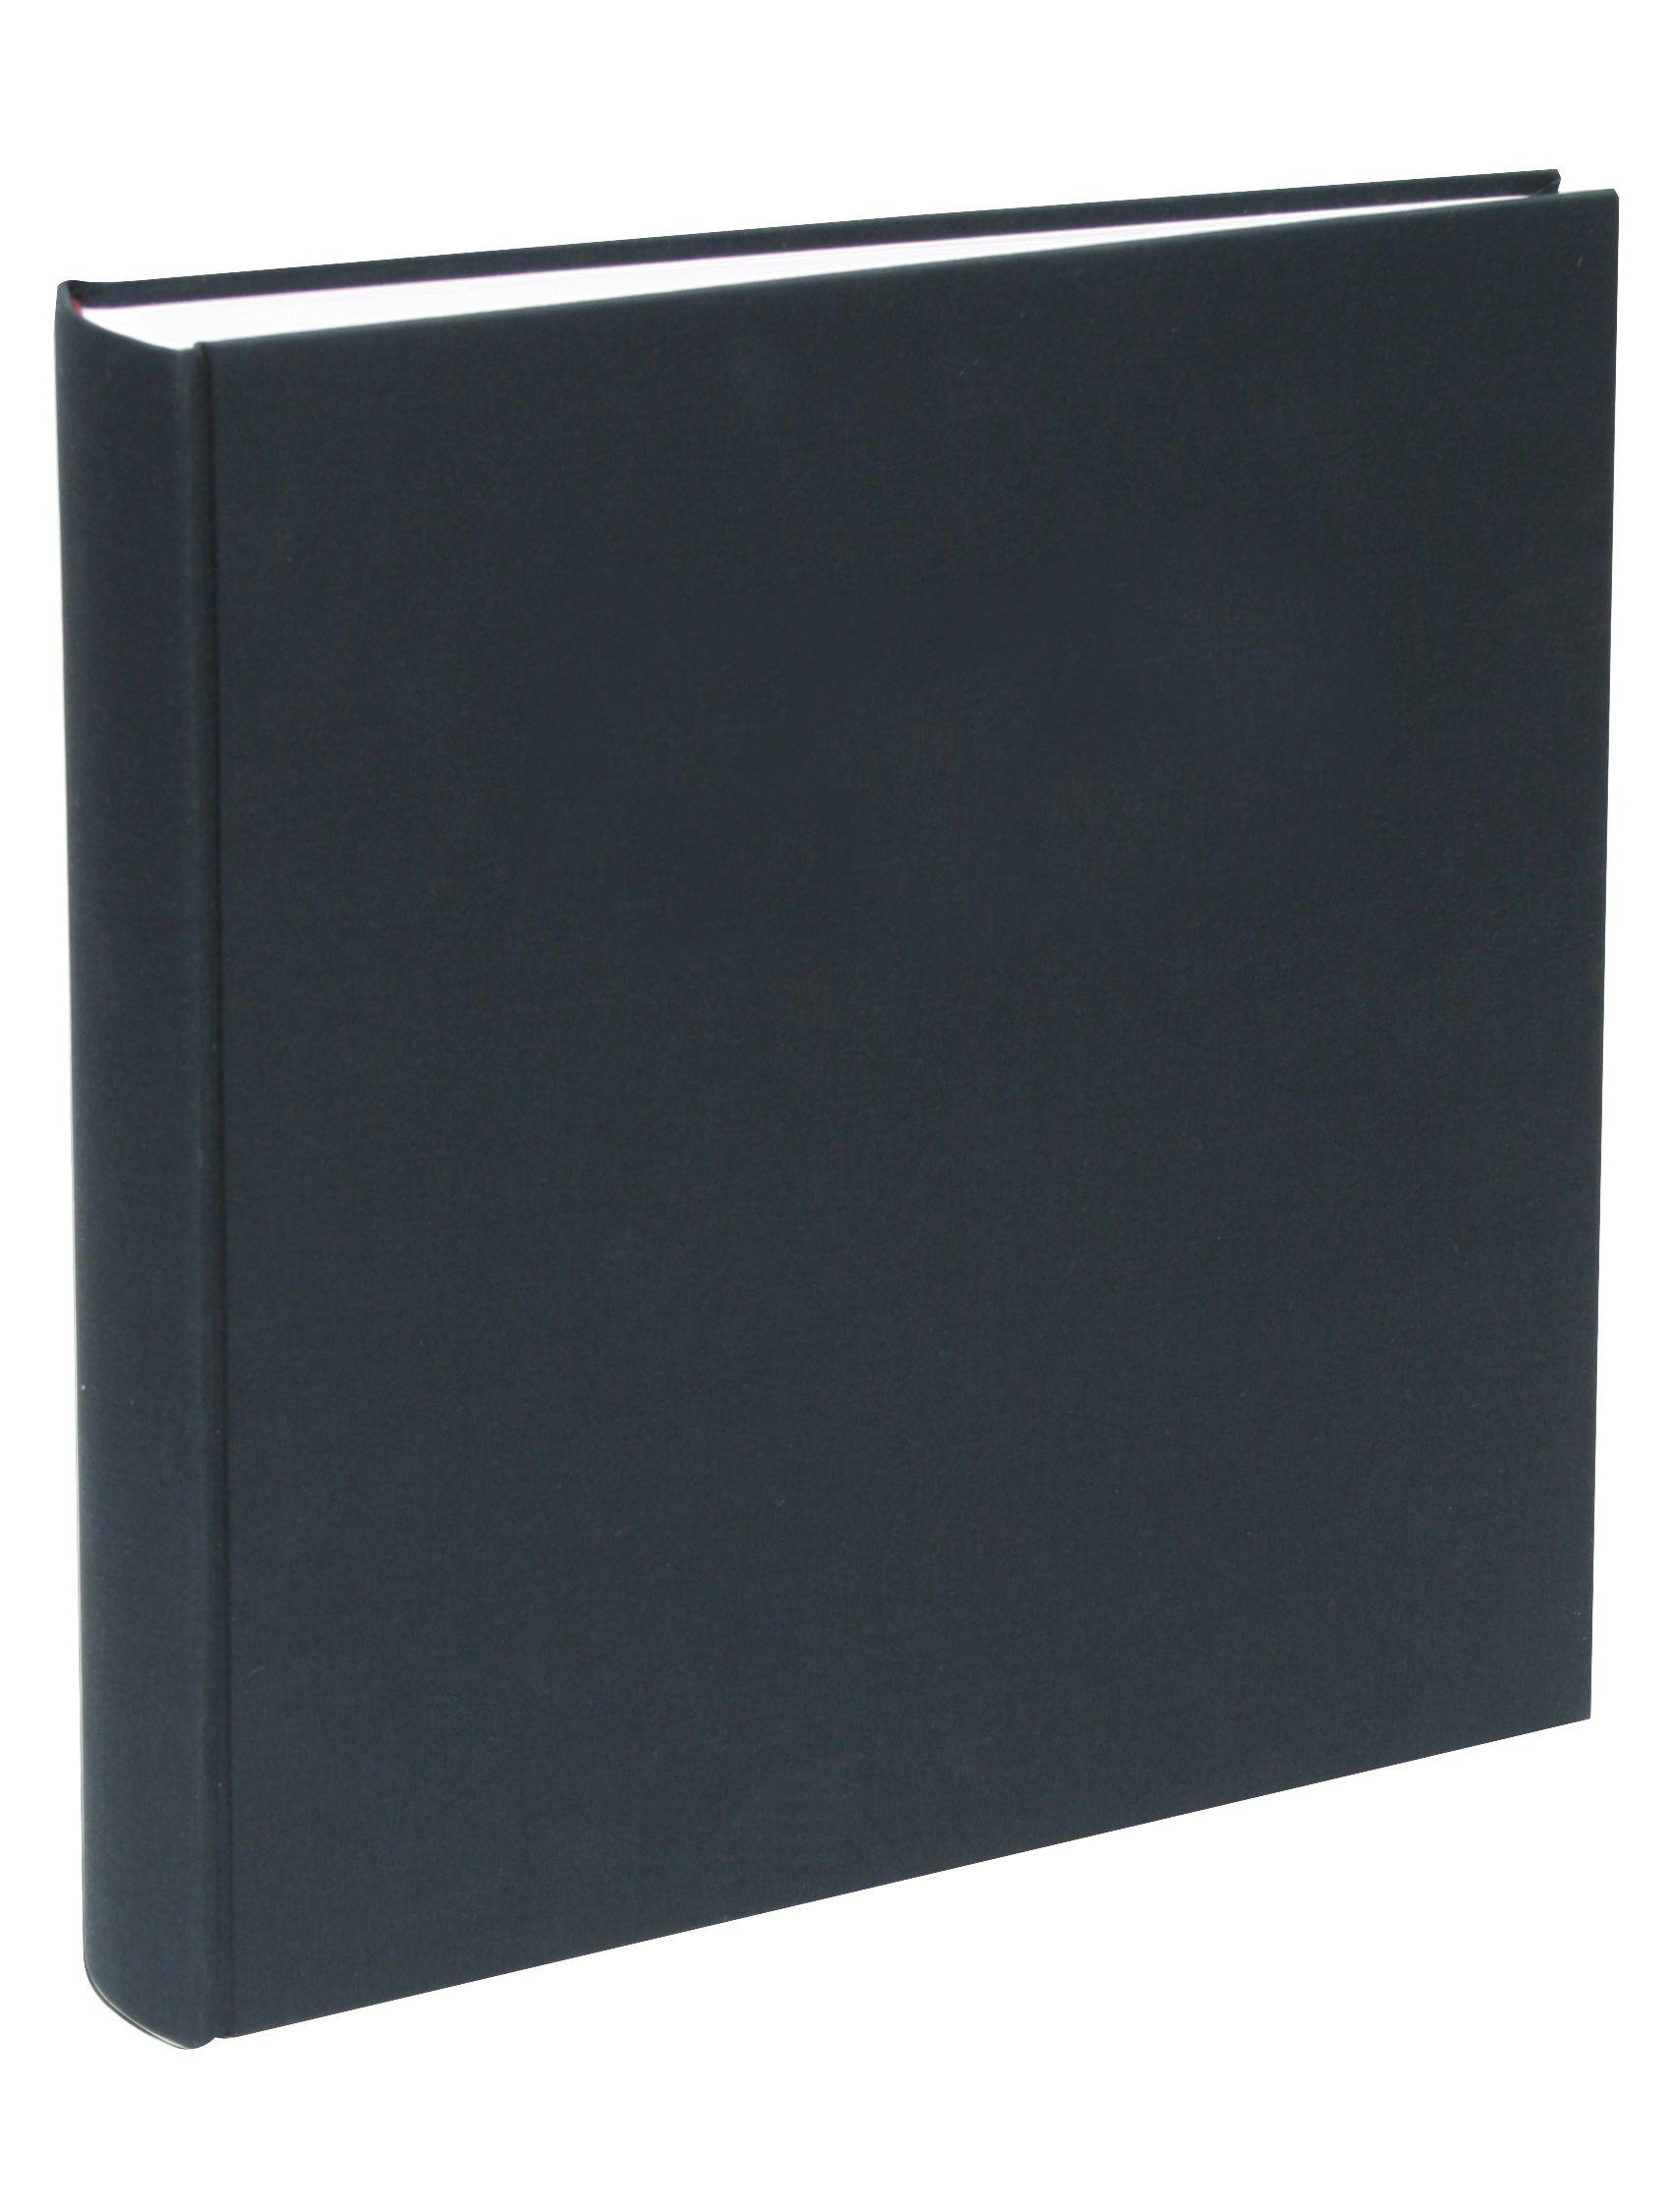 kleefalbum zwart, linnen, 100 bladzijden A10D20 100SI